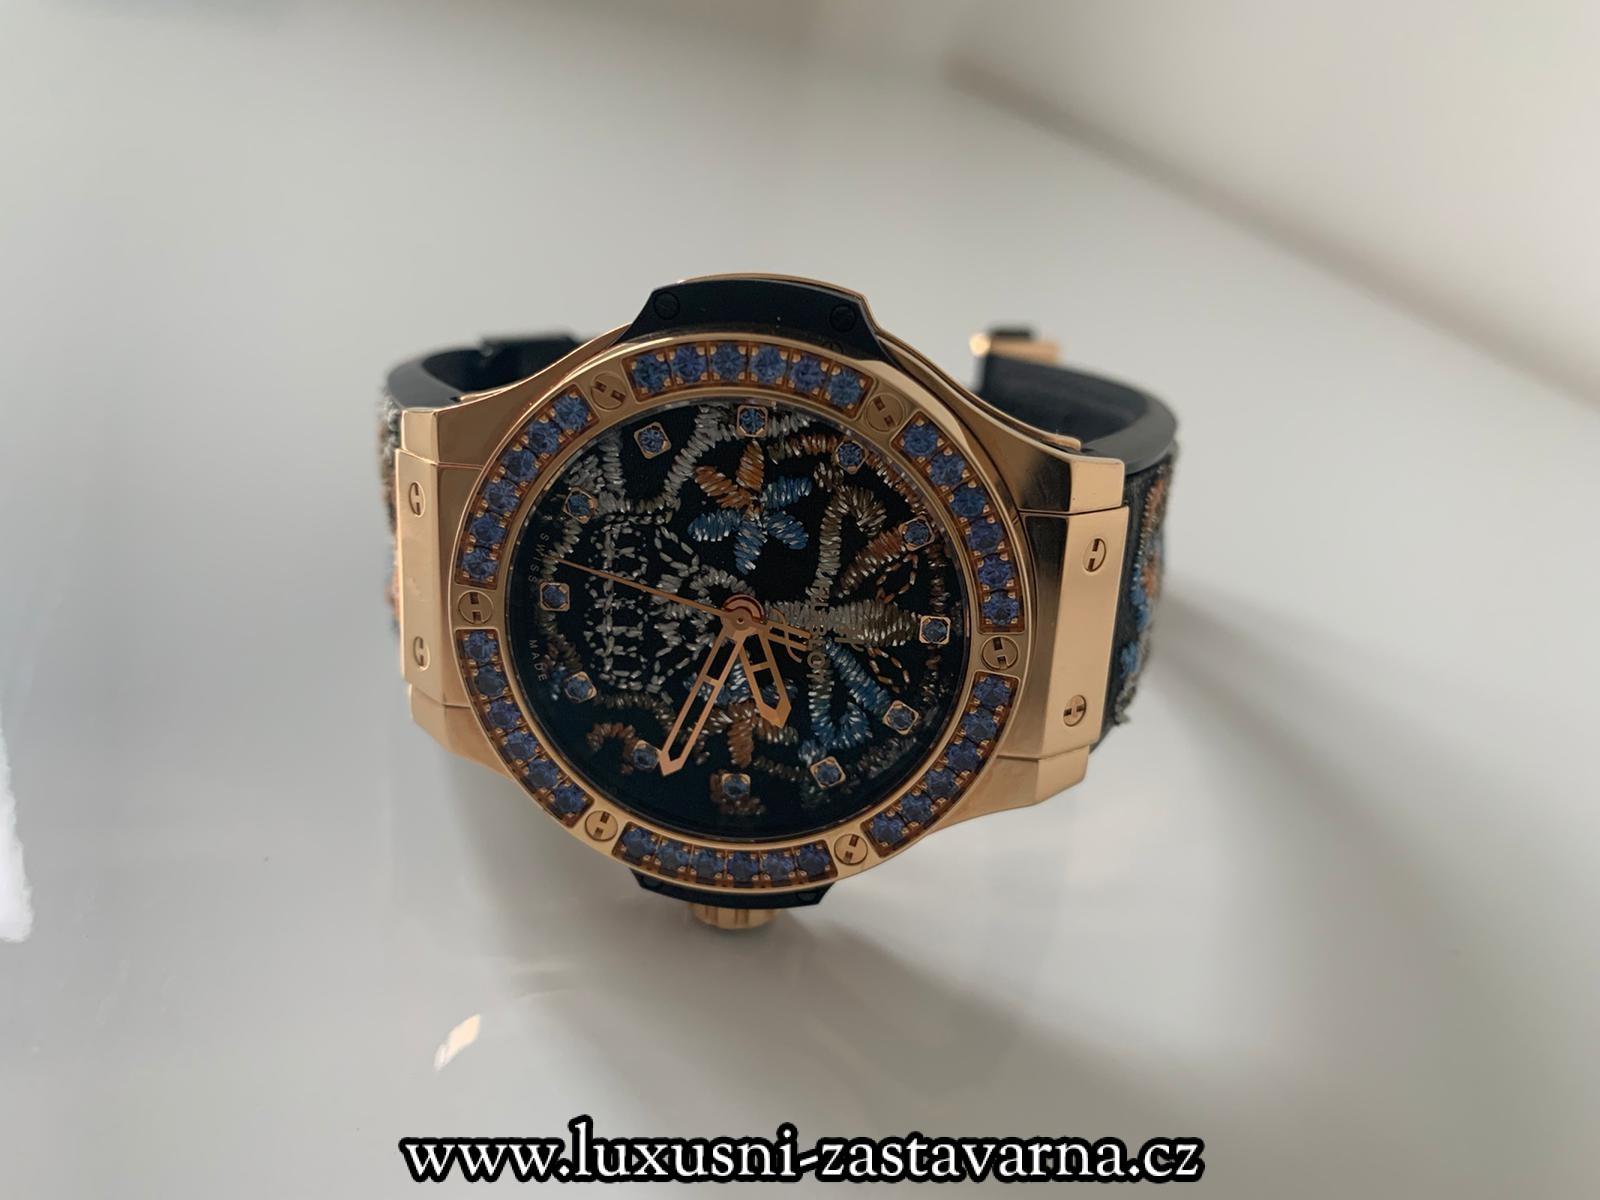 Hublot_Big_Bang_Broderi_18_K_Solid_Rose_Gold_Automatic_41mm_005